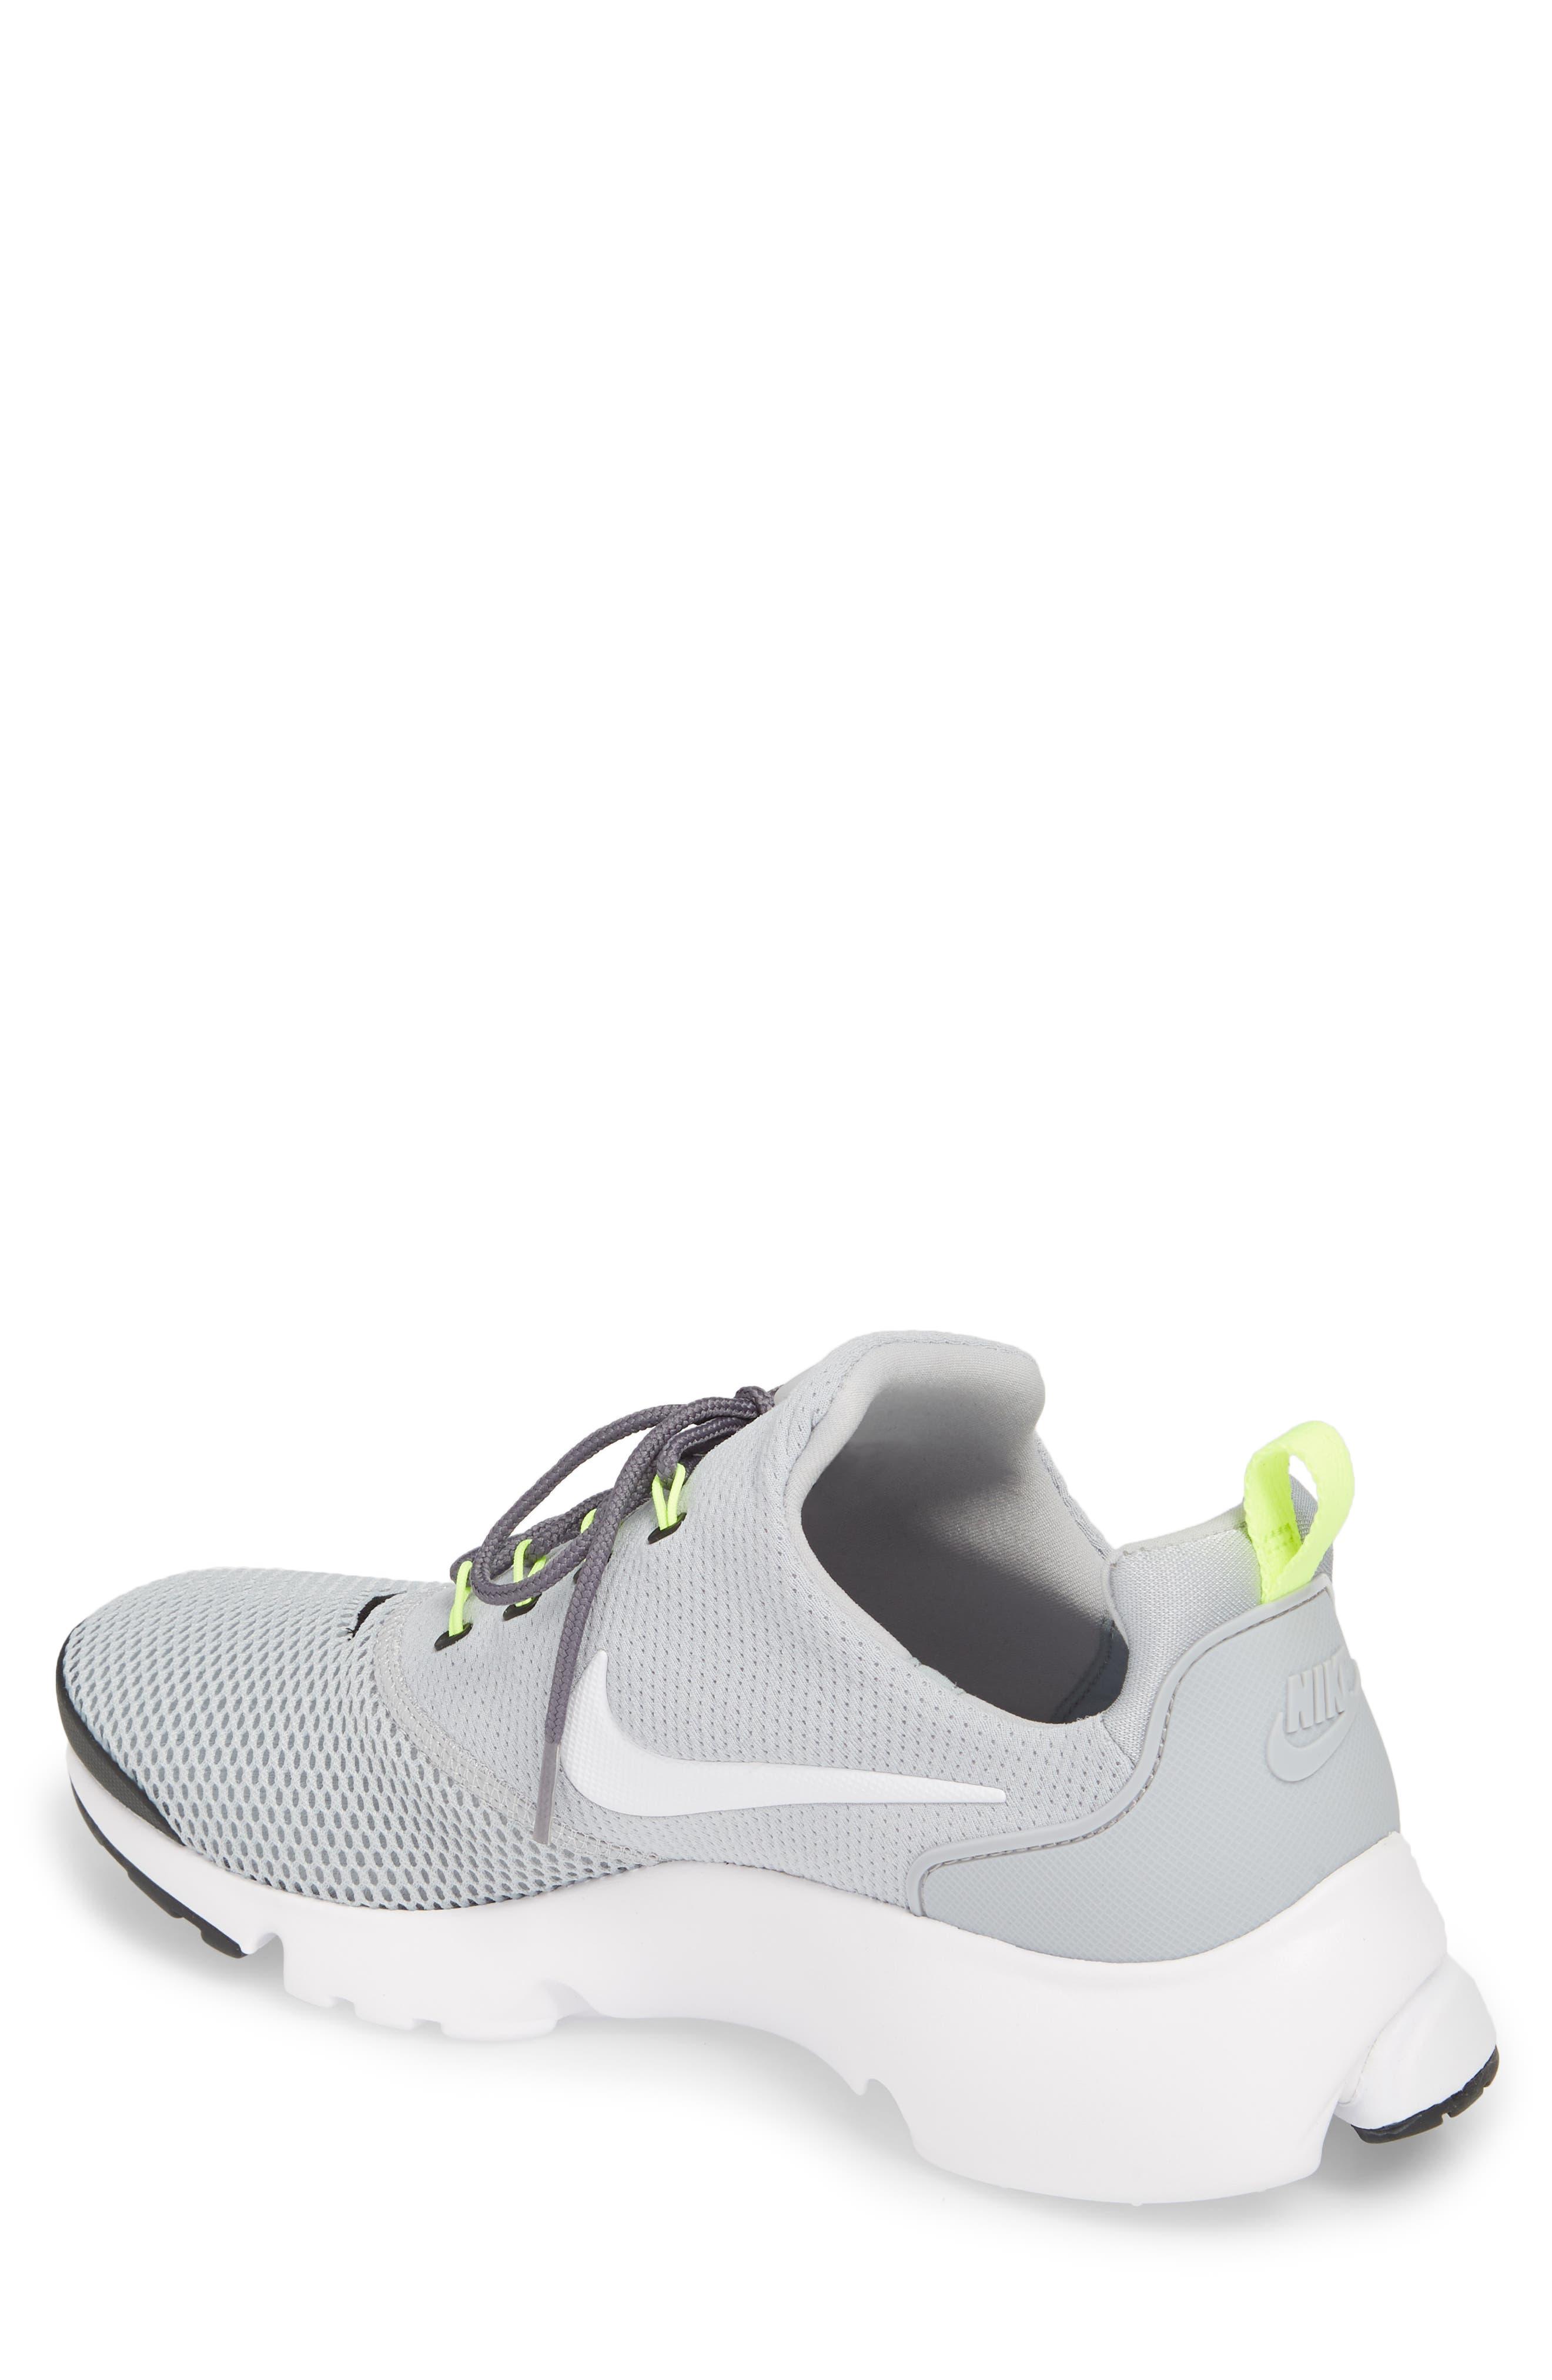 Presto Fly Sneaker,                             Alternate thumbnail 2, color,                             Wolf Grey/ White/ Volt